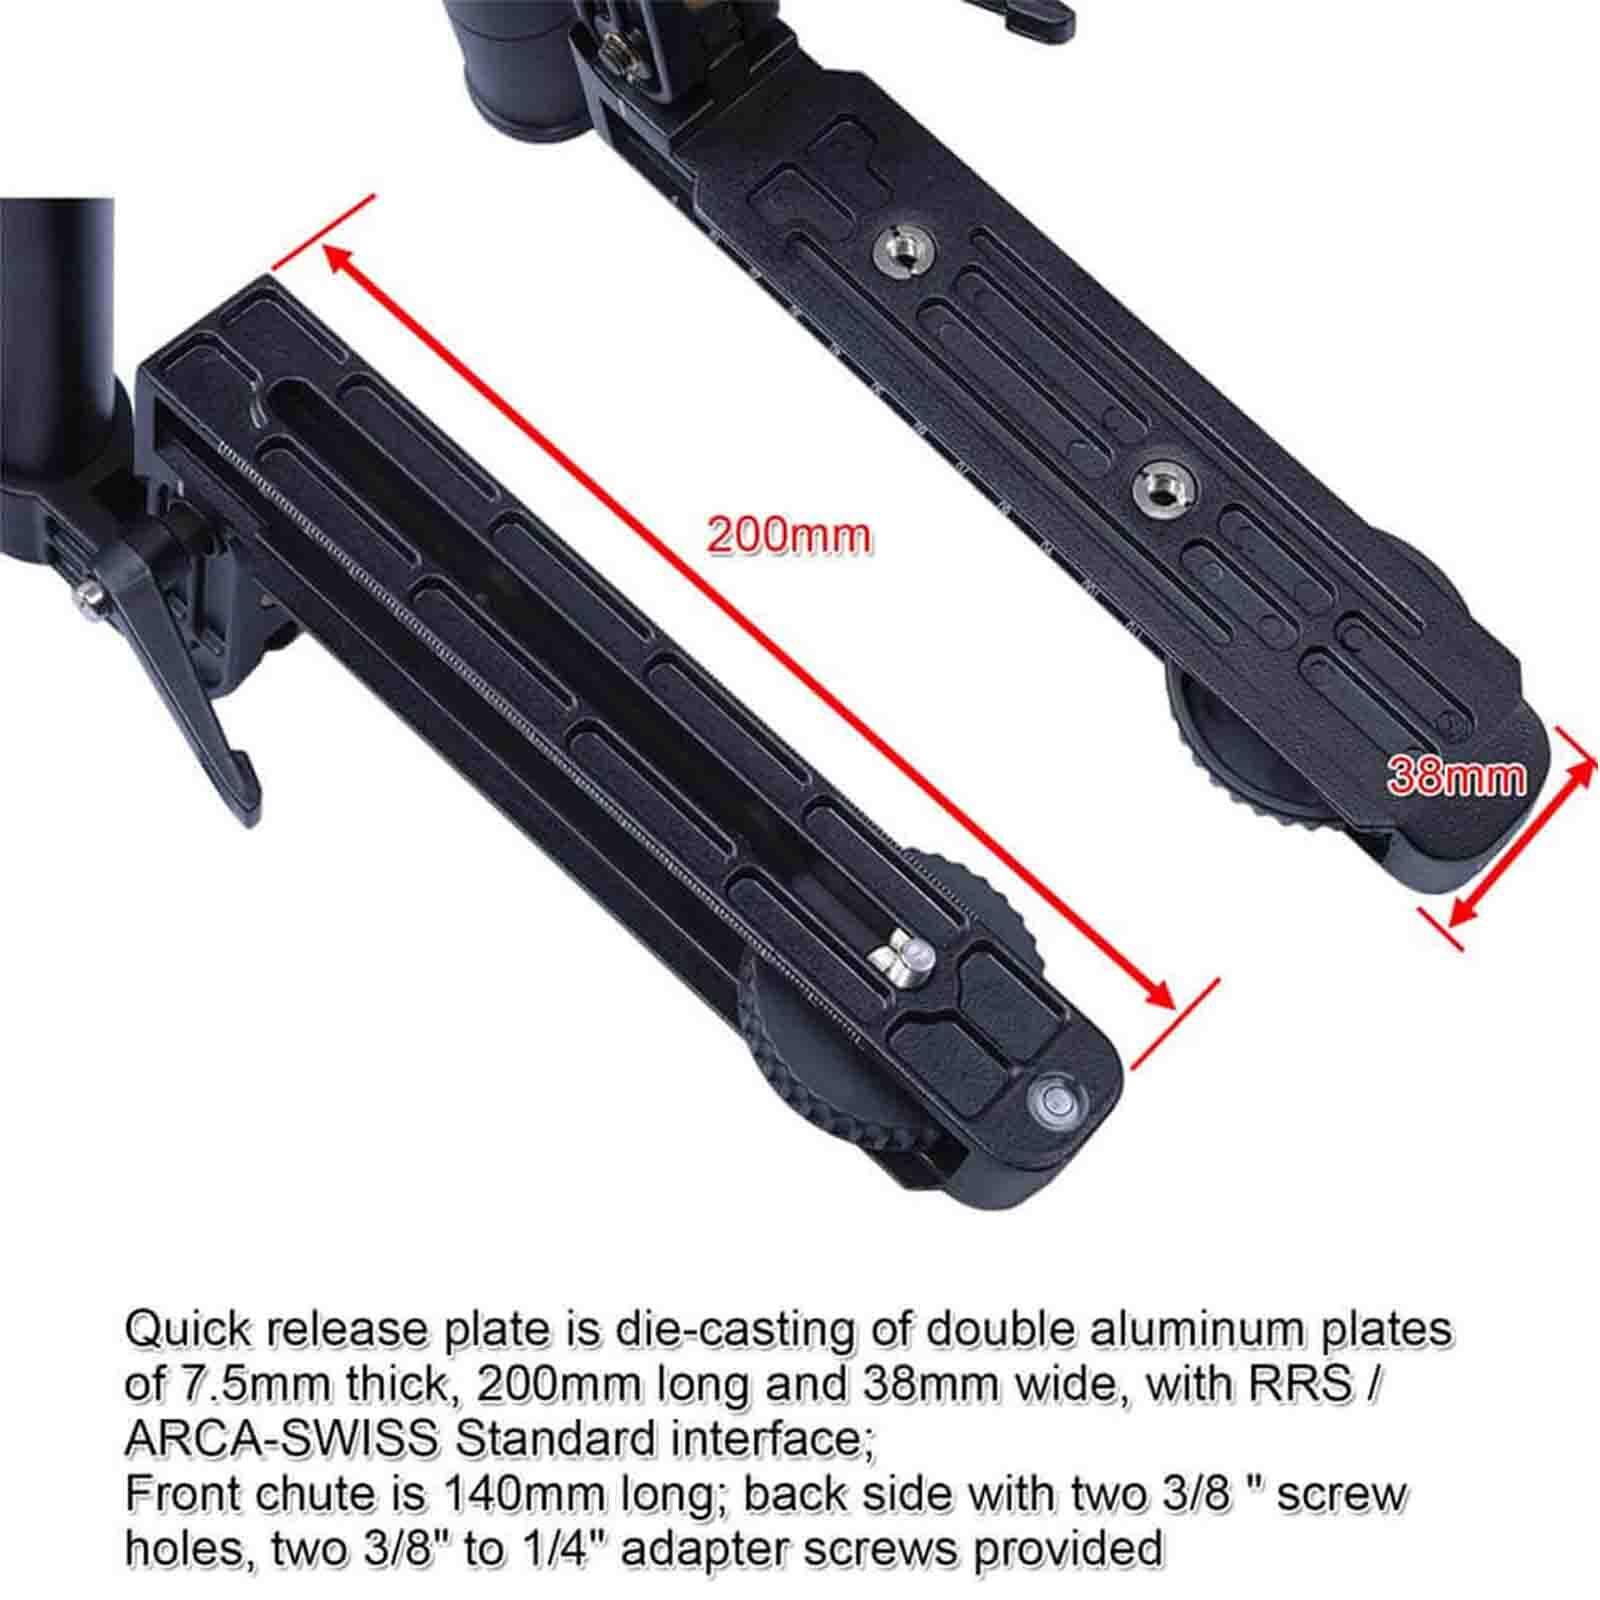 Baosity 400mm Telephoto Lens Quick Release Plate Long-Focus Support for Camera Tripod Ballhead Fits Arca-Swiss